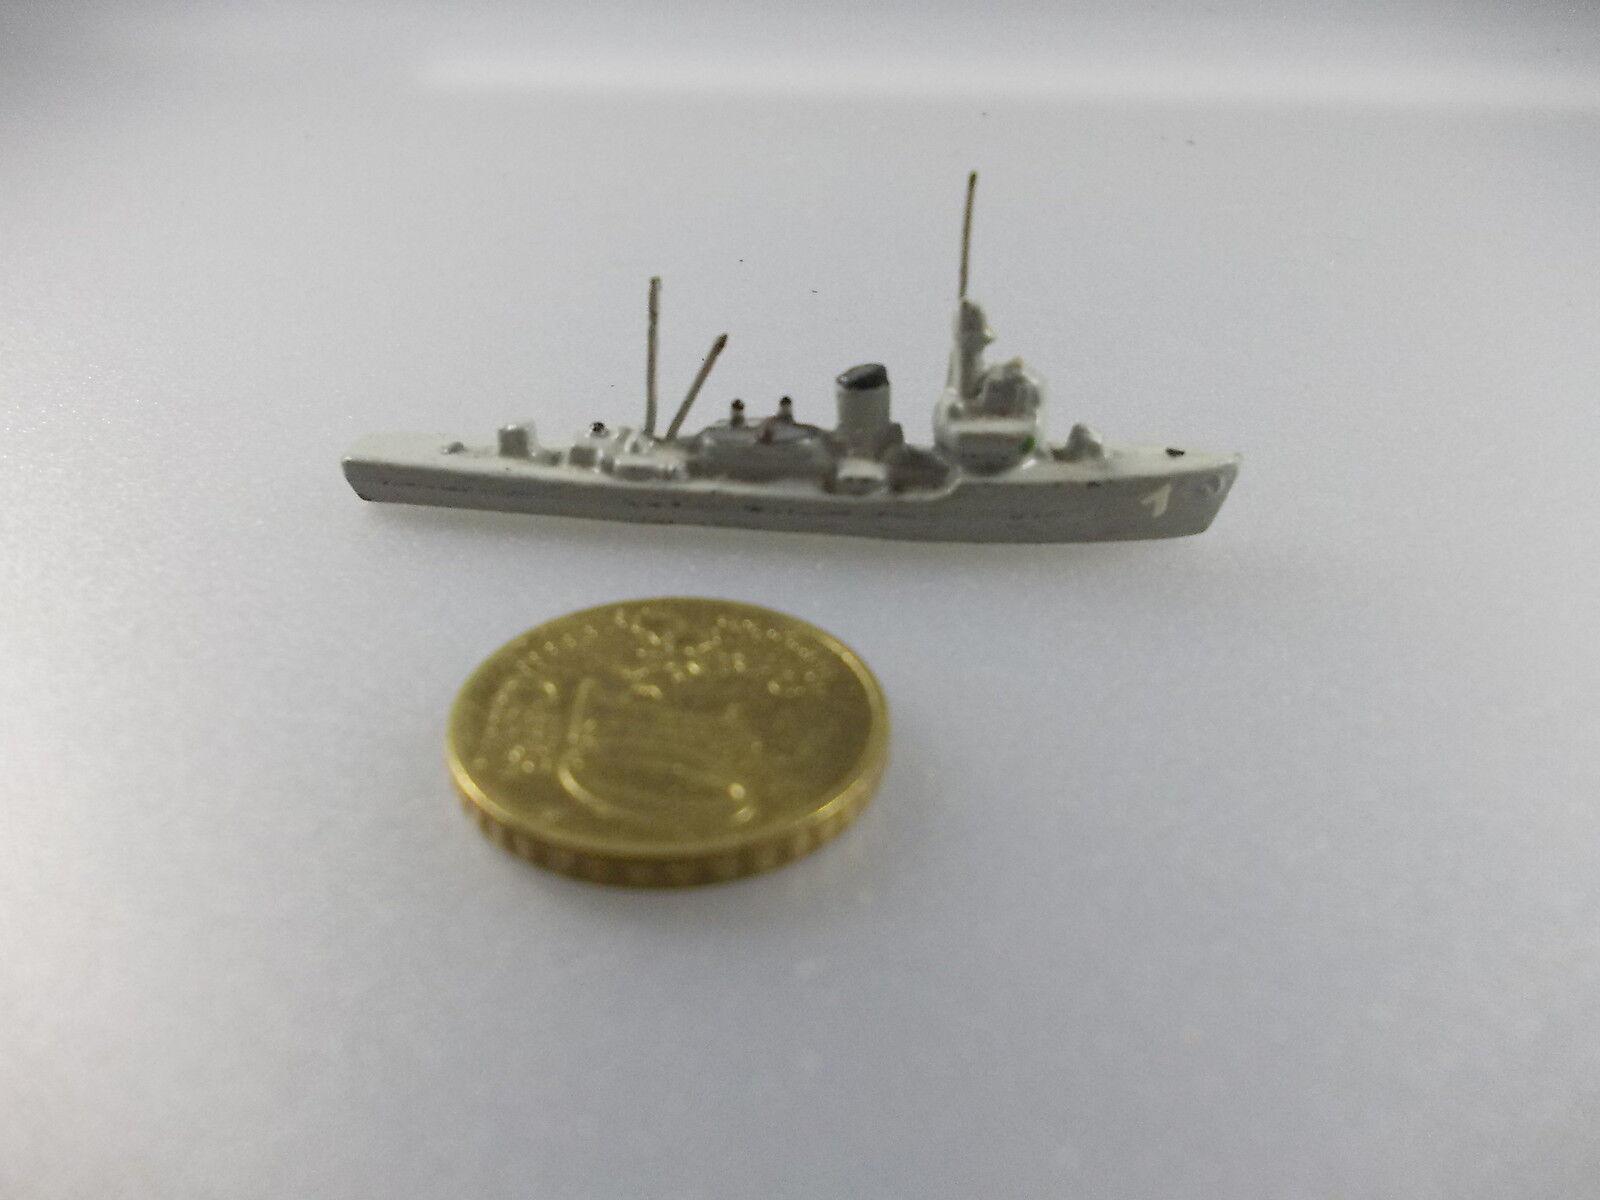 Wiking  barco modelo modelo modelo (Nº 101 k24)  Compra calidad 100% autentica